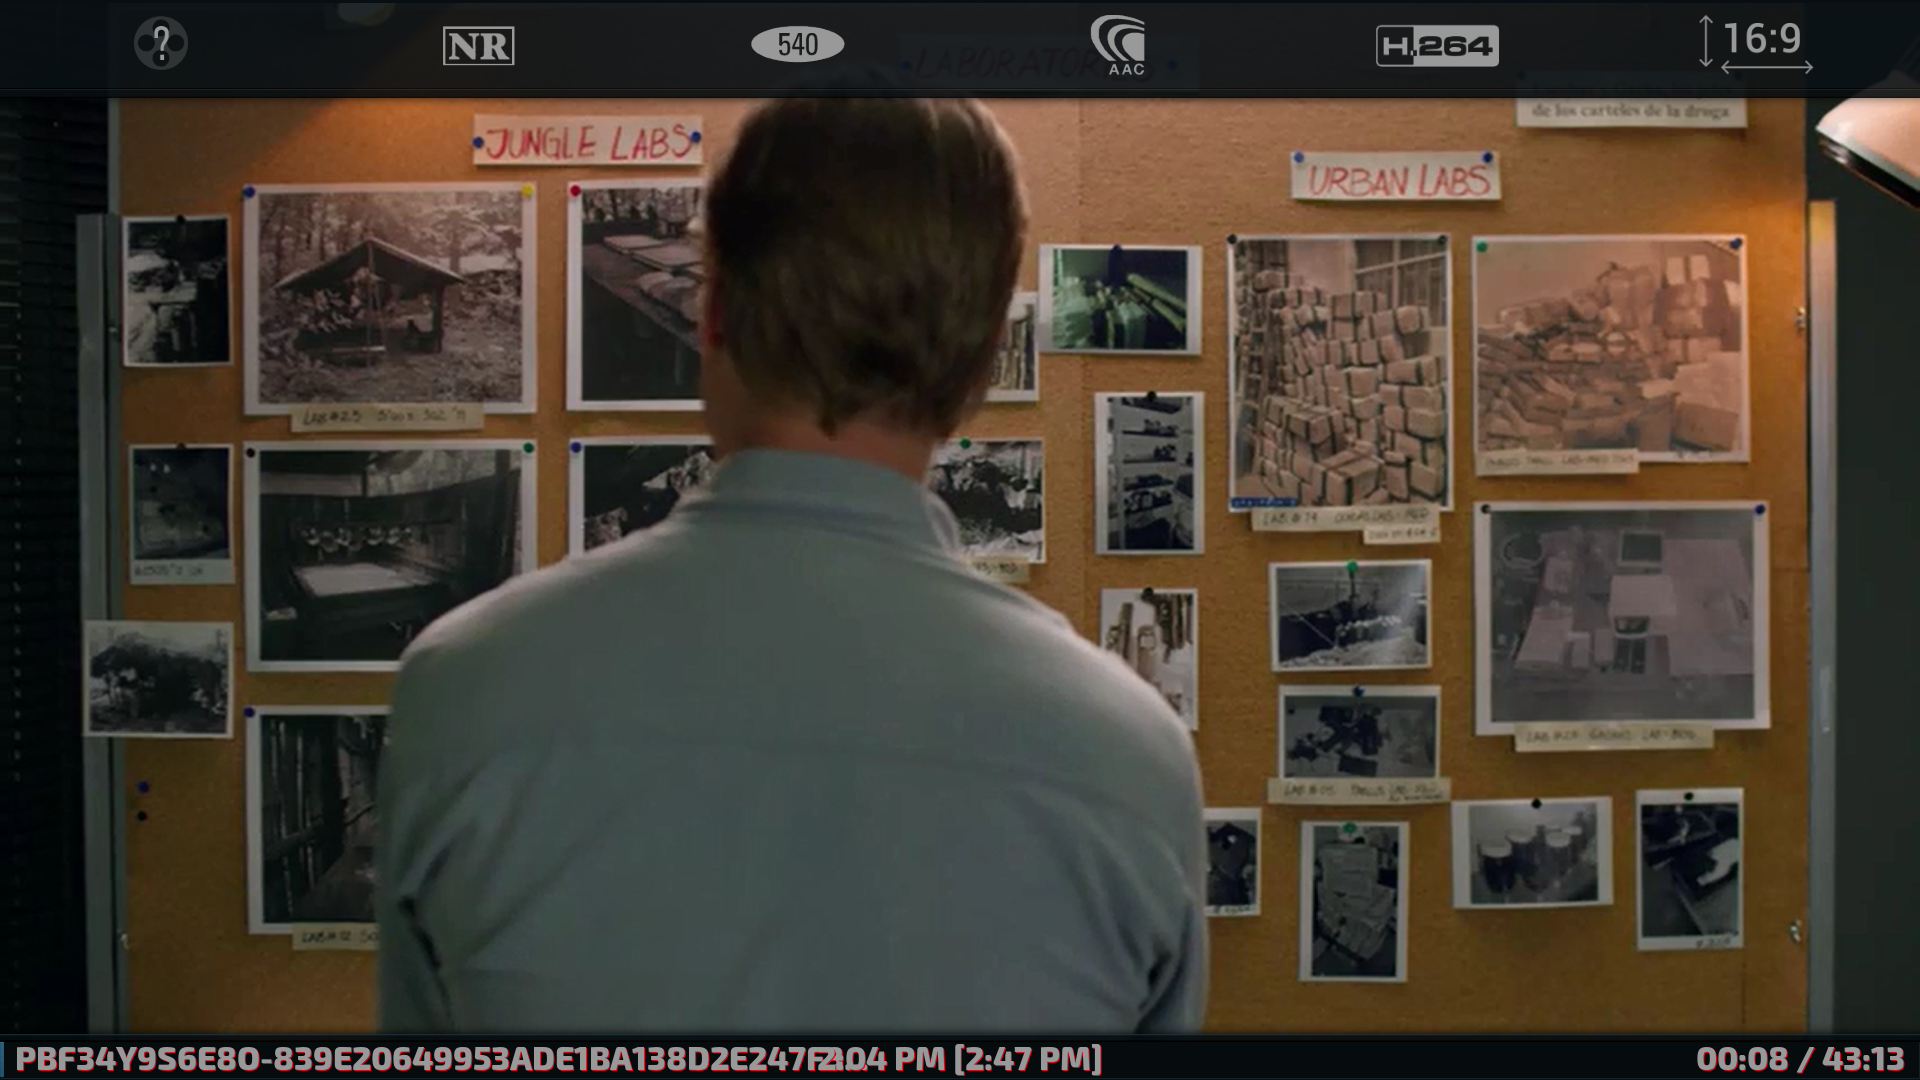 Screenshot 2015-11-13 14.04.14